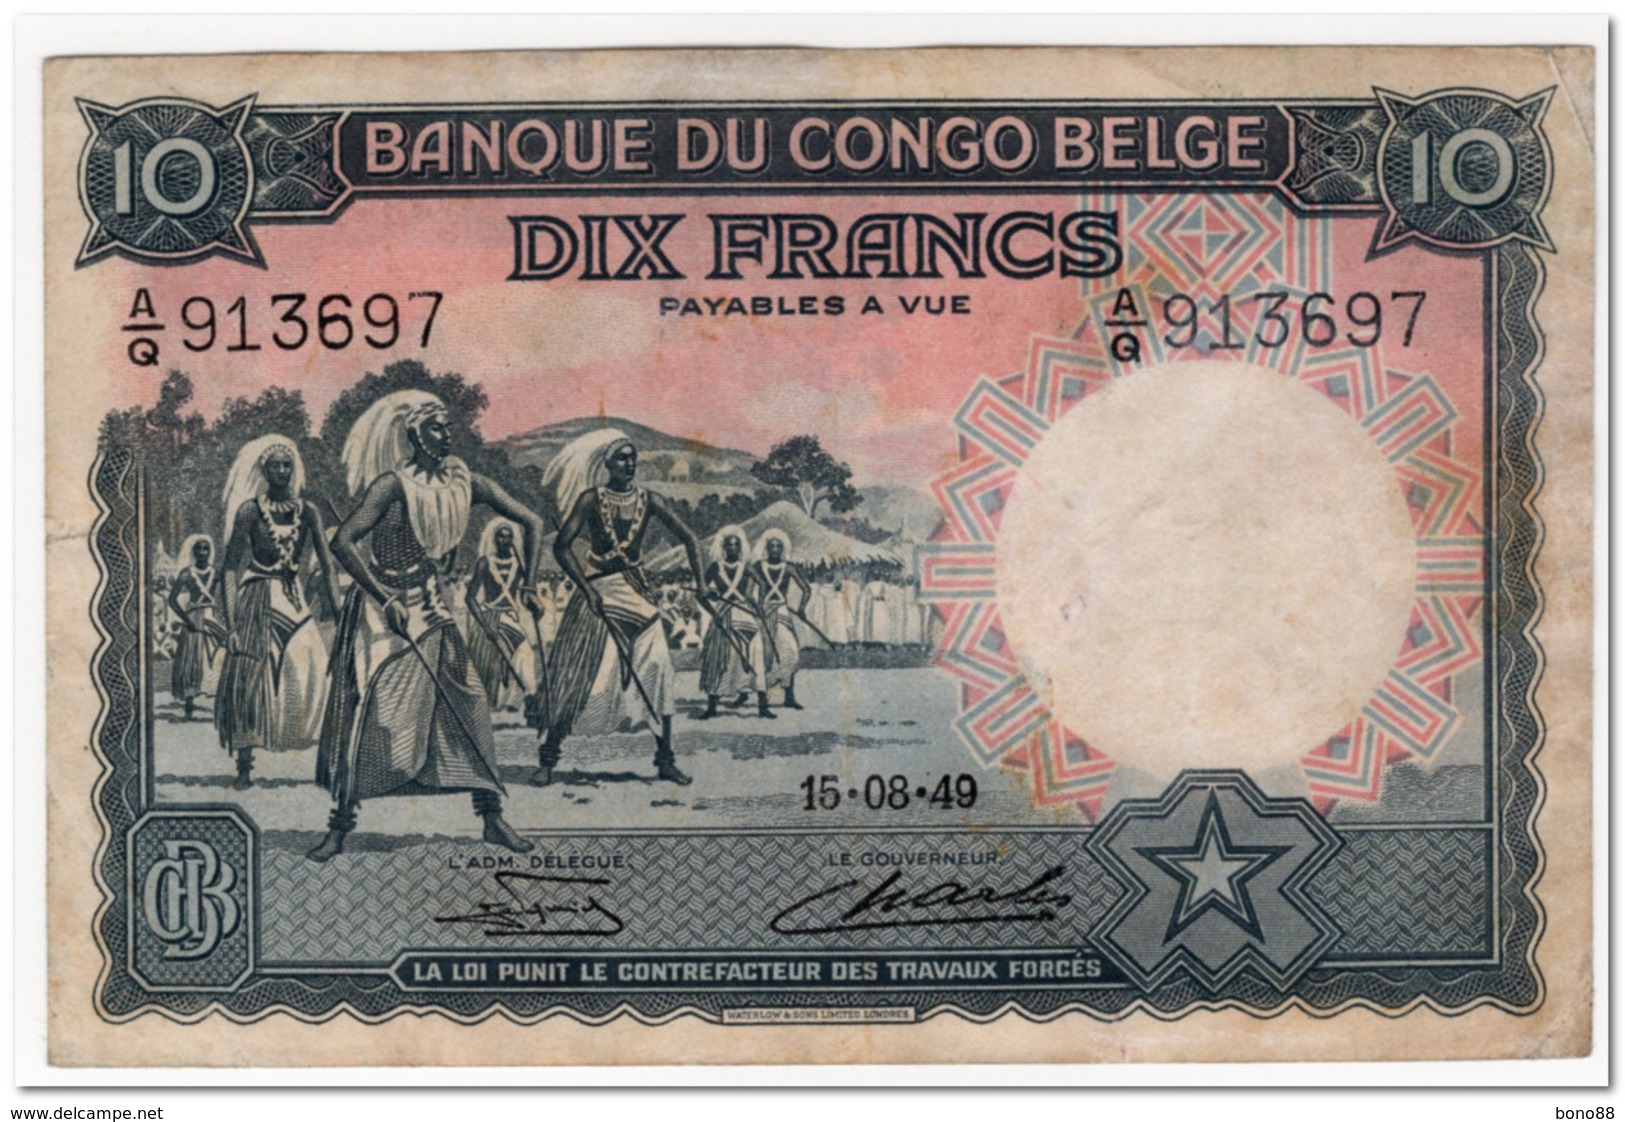 BELGIAN CONGO,10 FRANCS,1949,P.14,VF-XF - Congo